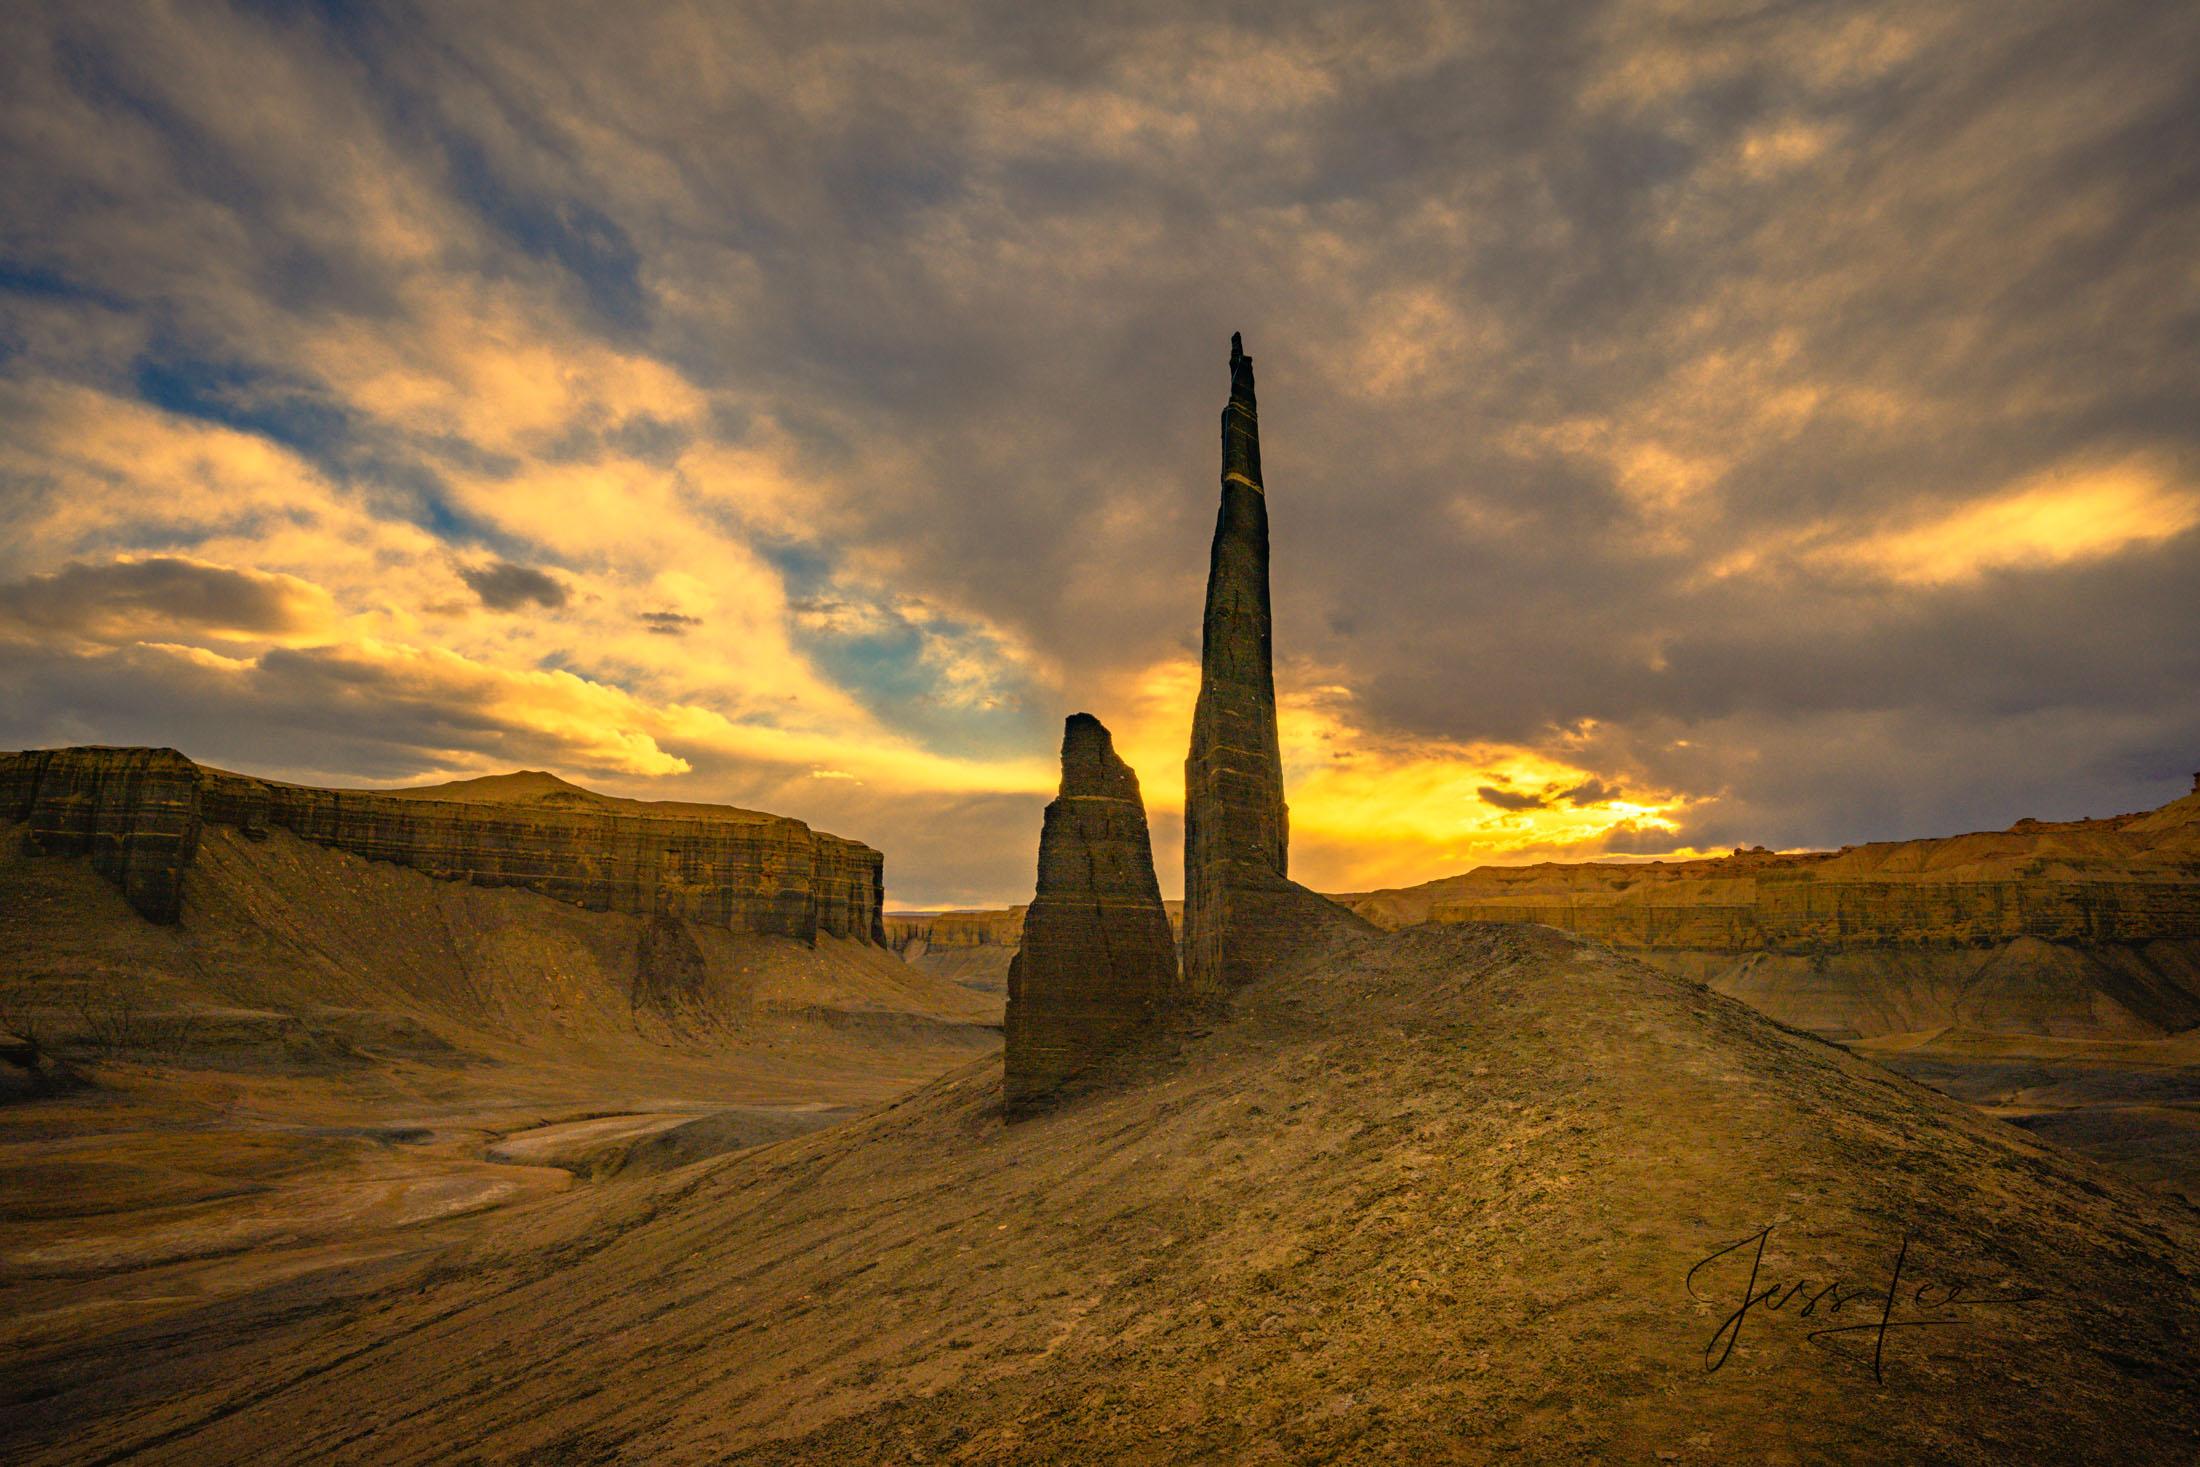 Fine Art Photographic print of Desert Monoliths in Utah's San Rafael Swell